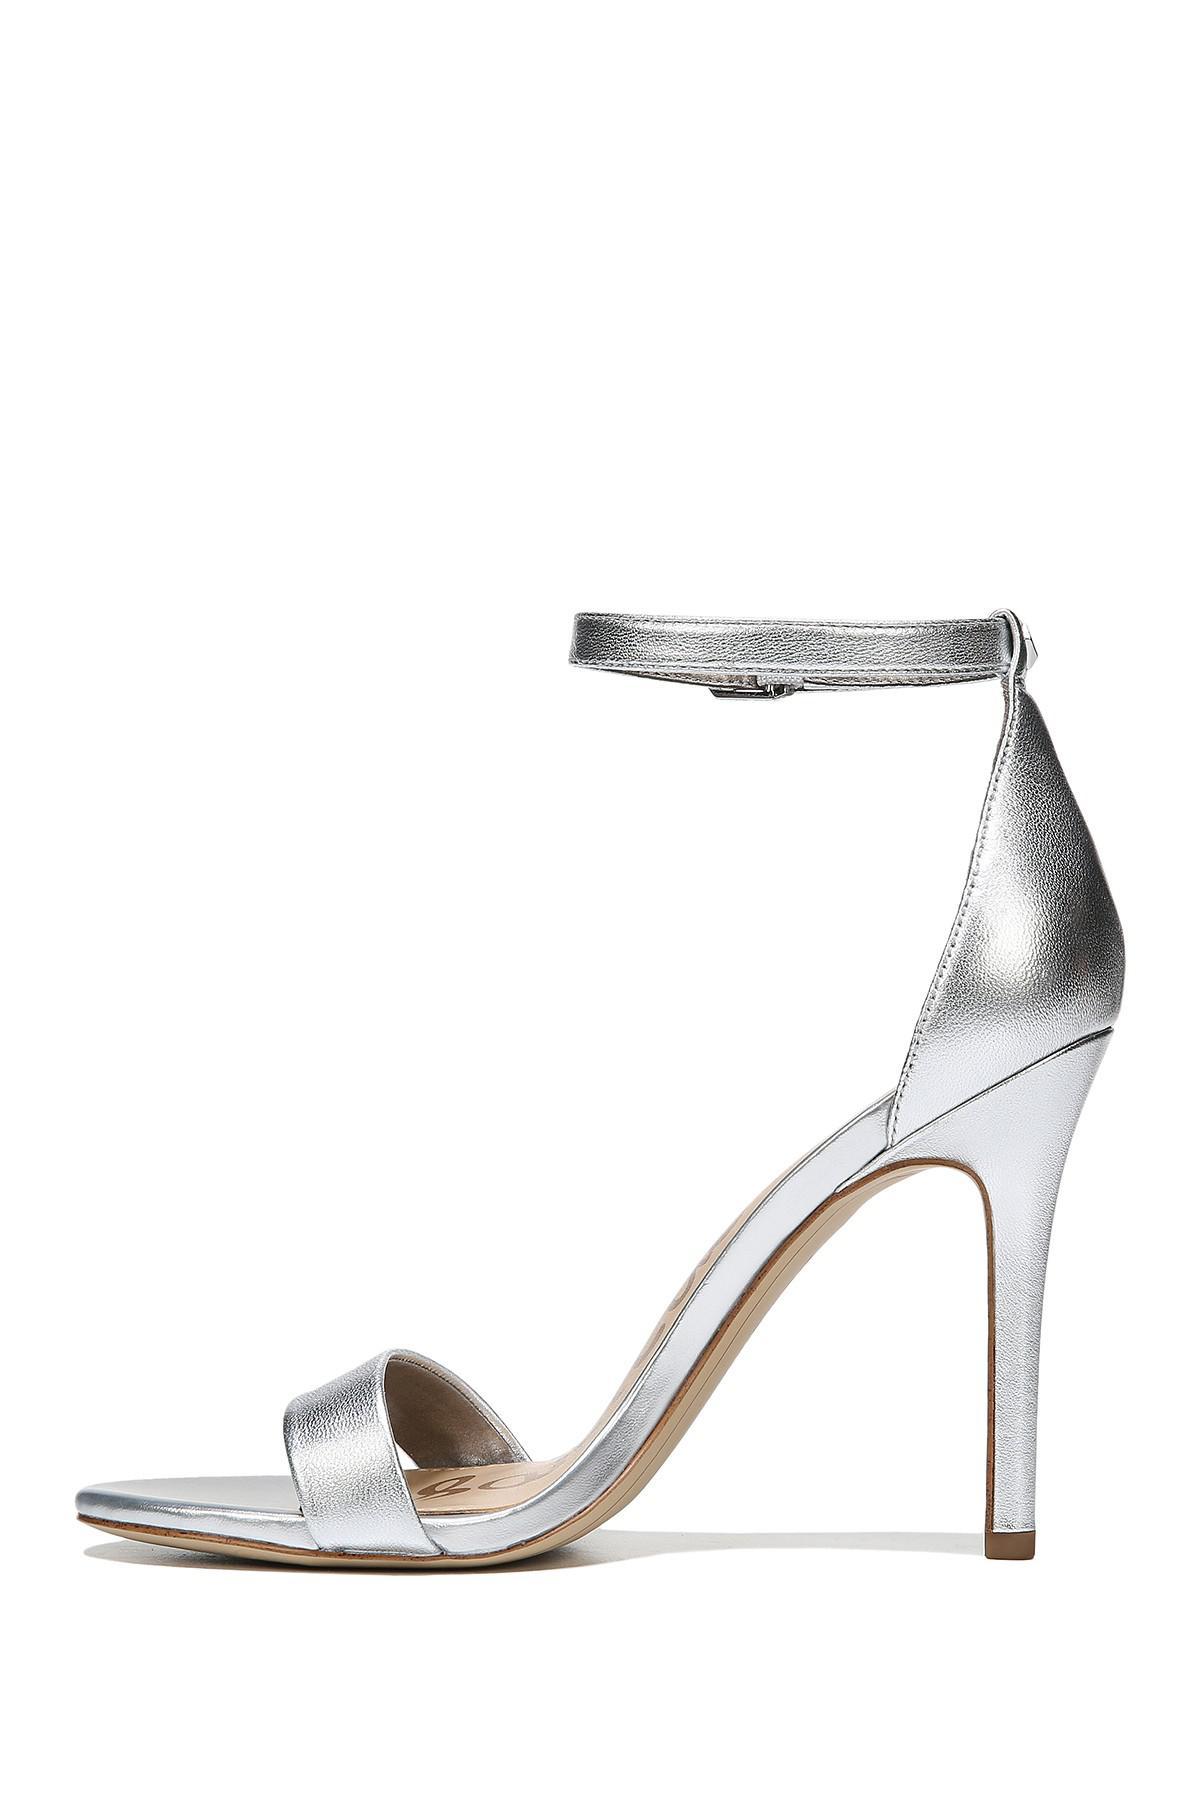 a705be04c17ec Lyst - Sam Edelman Amee Ankle Strap Heel Sandal